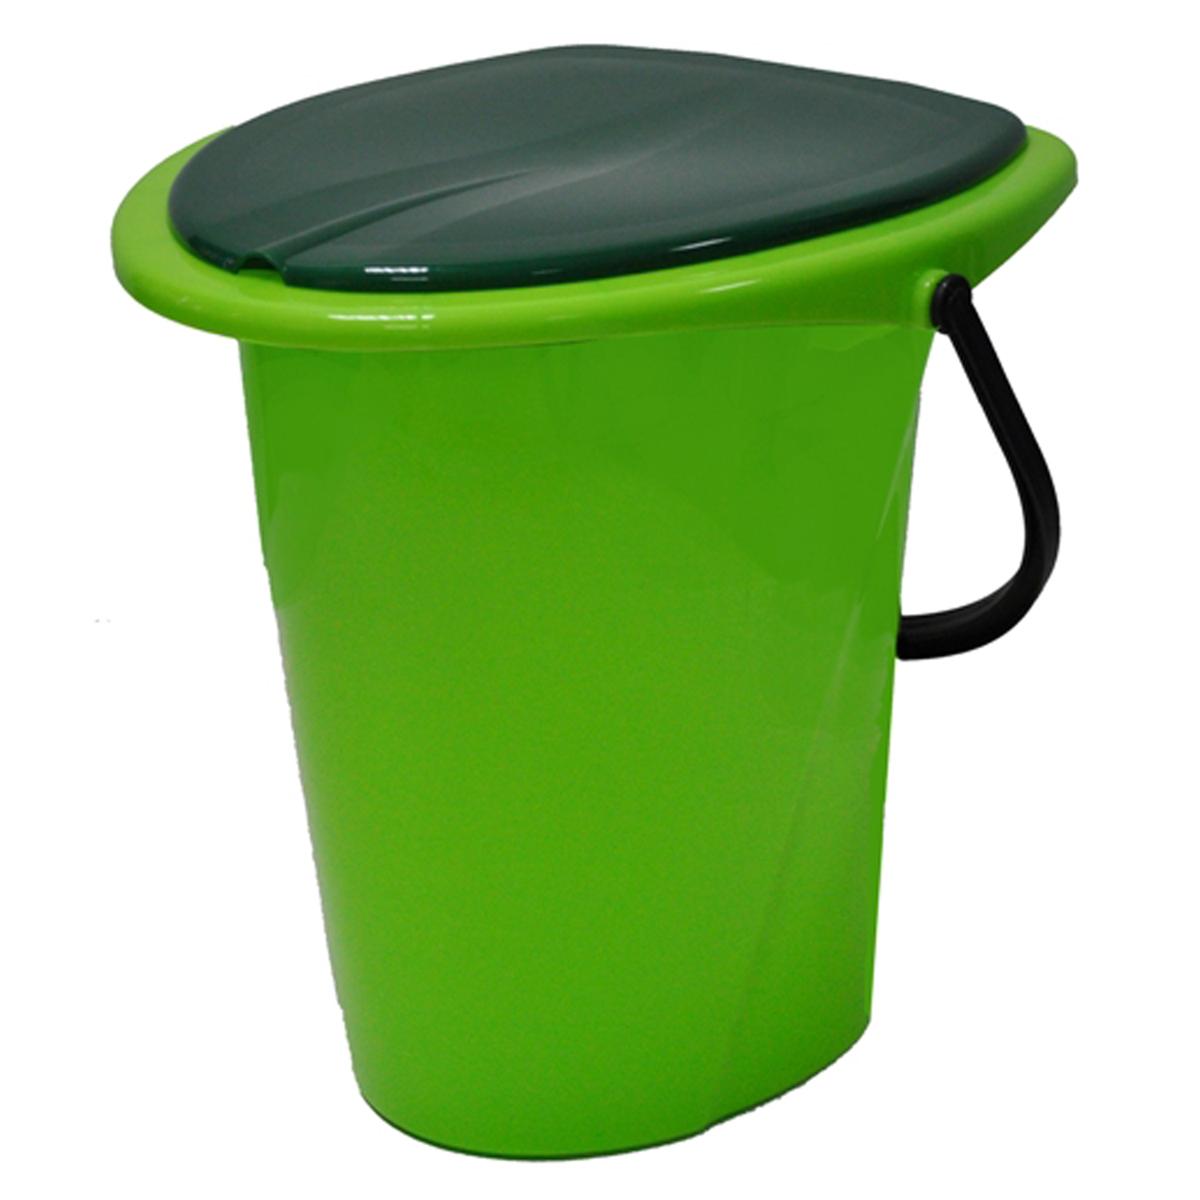 "Ведро-туалет ""InGreen"", цвет: зеленый, салатовый, 17 л"